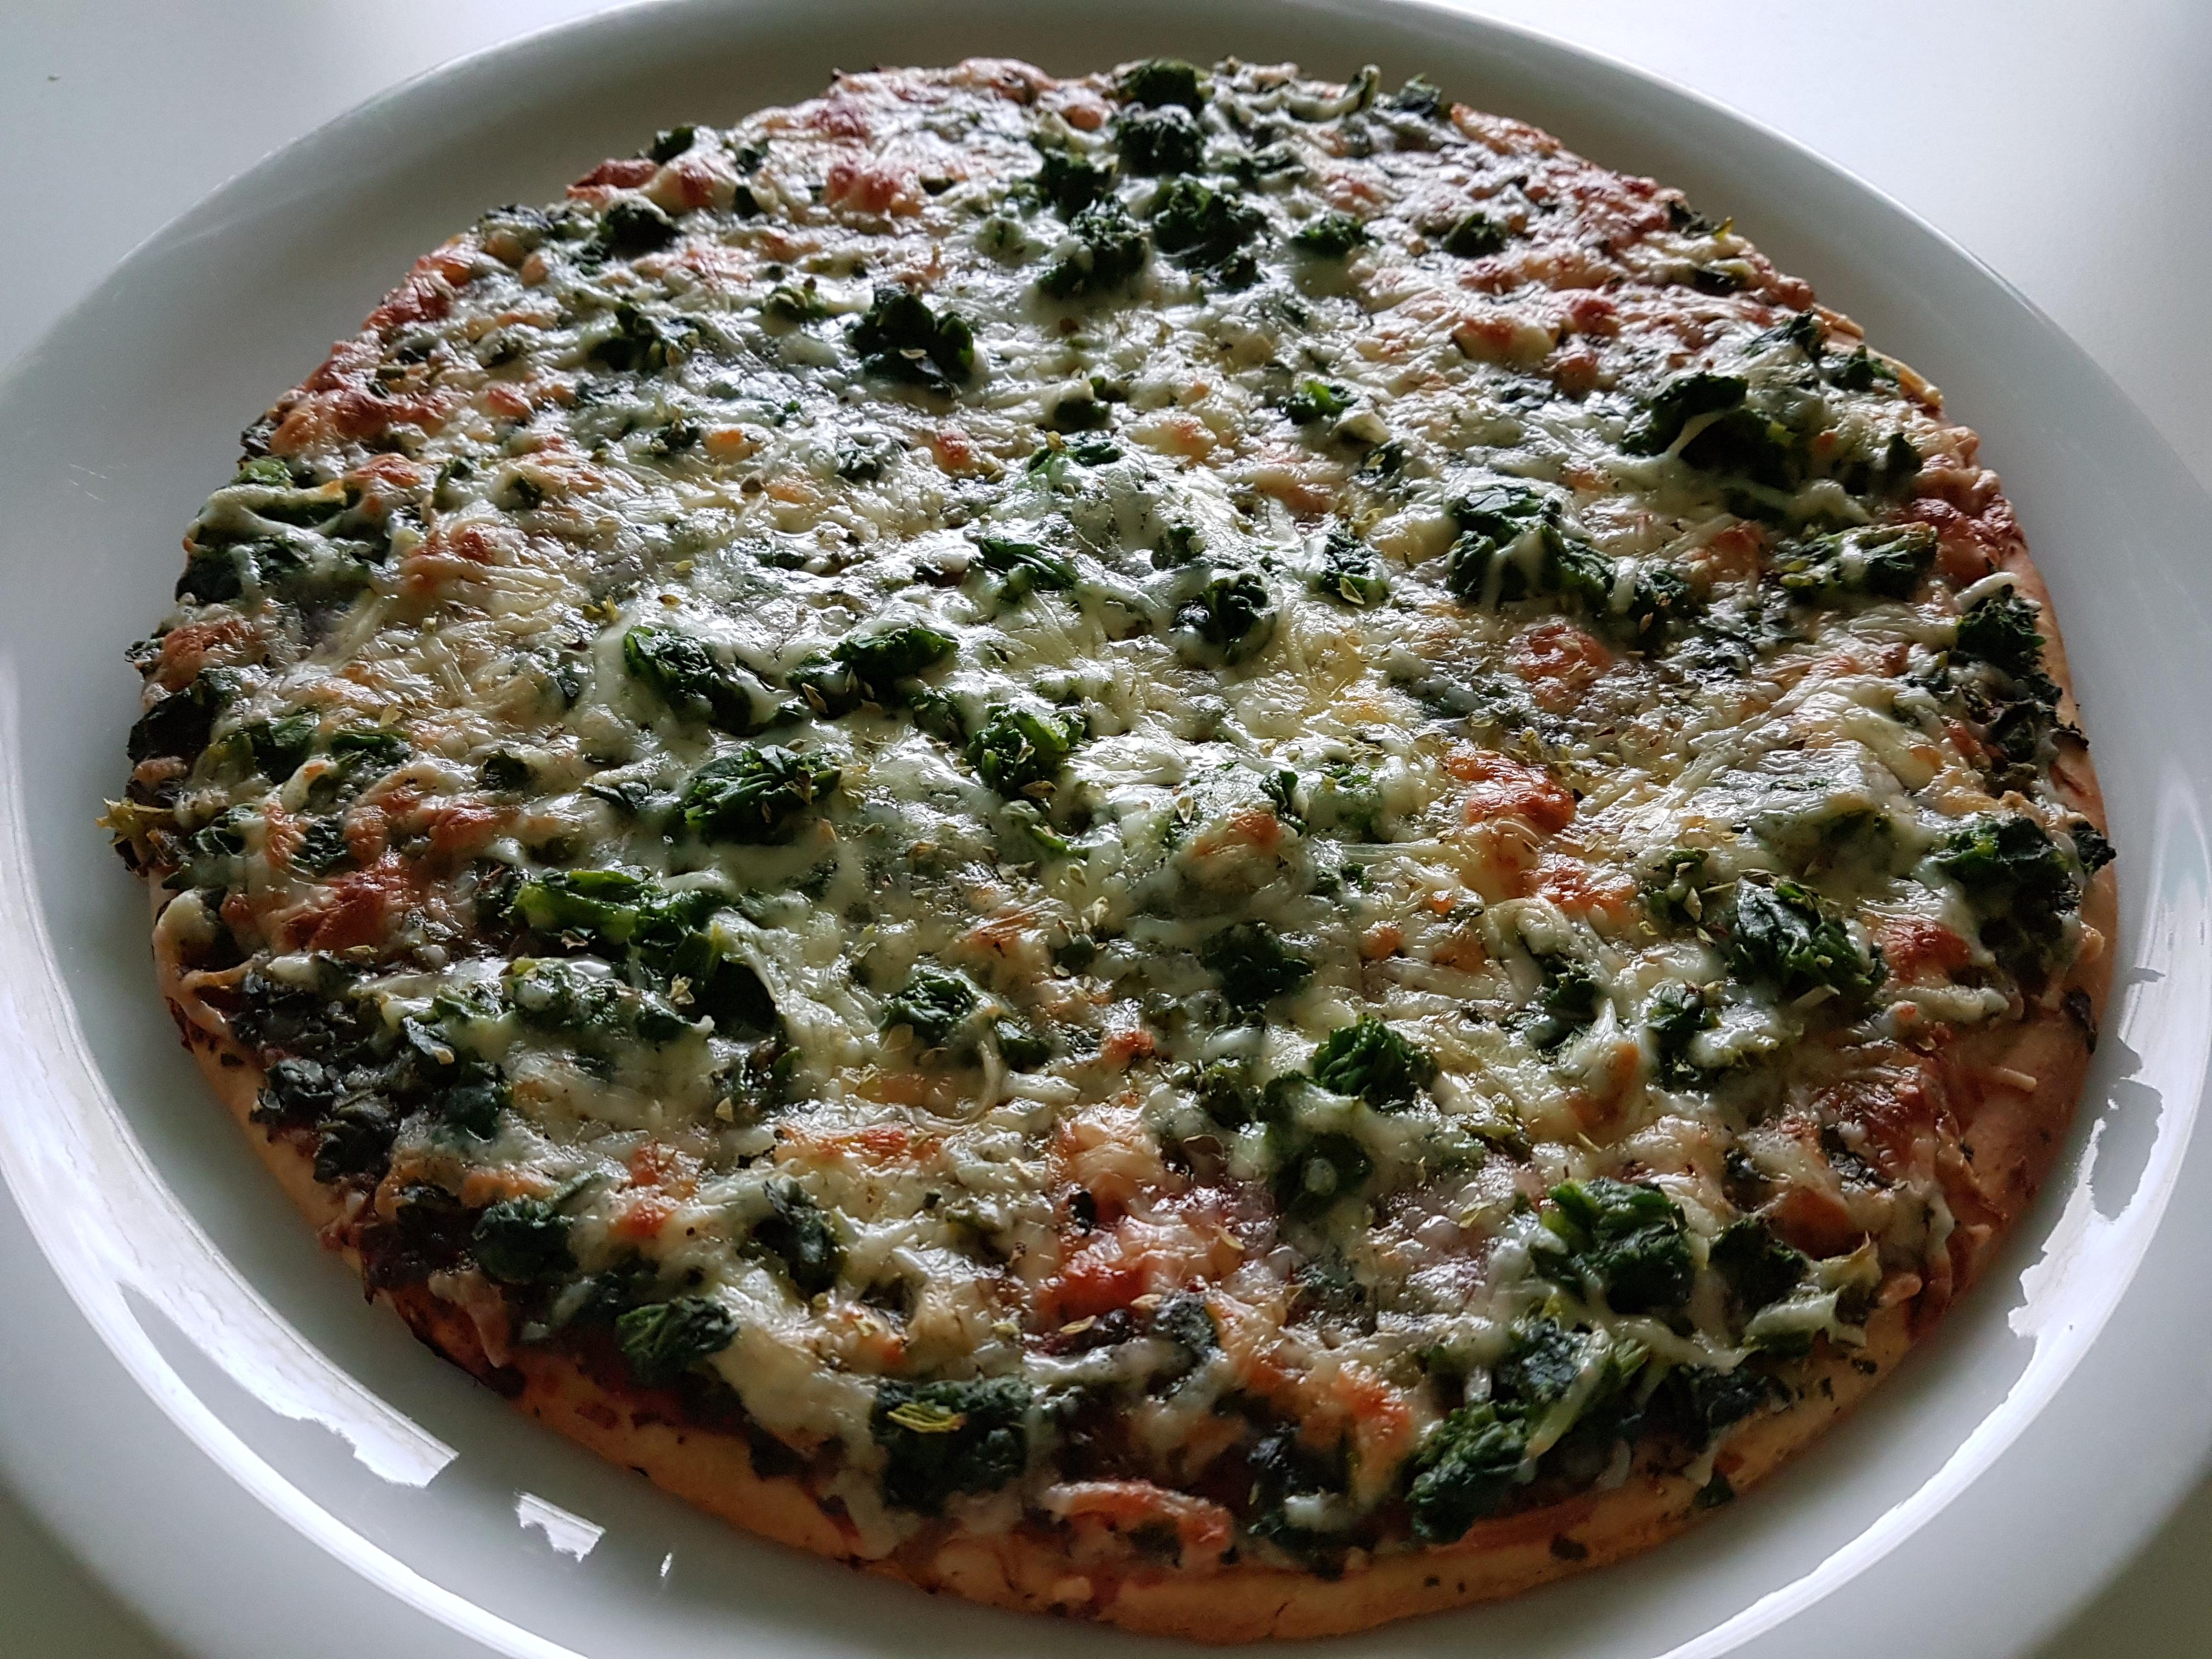 http://foodloader.net/Holz_2017-04-13_Pizza.jpg